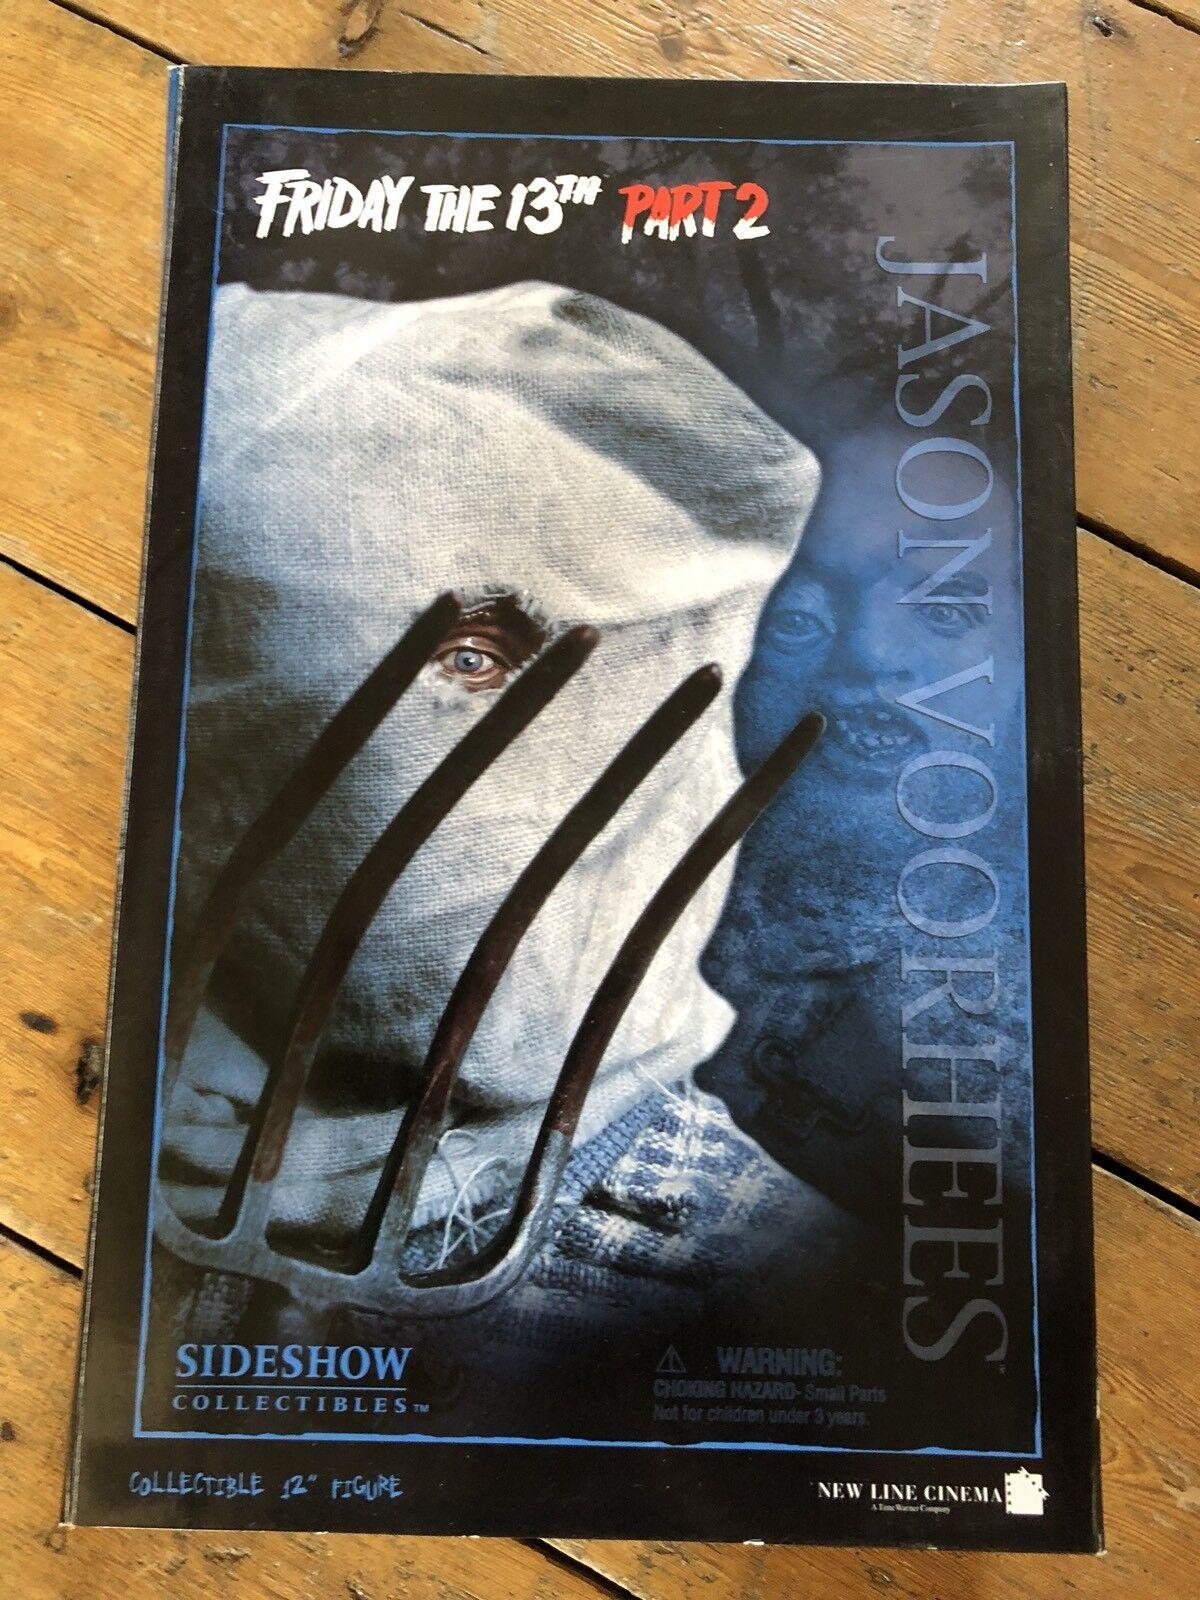 Venerdì 13 la Sideshow parte II Jason Voorhees afssc 84